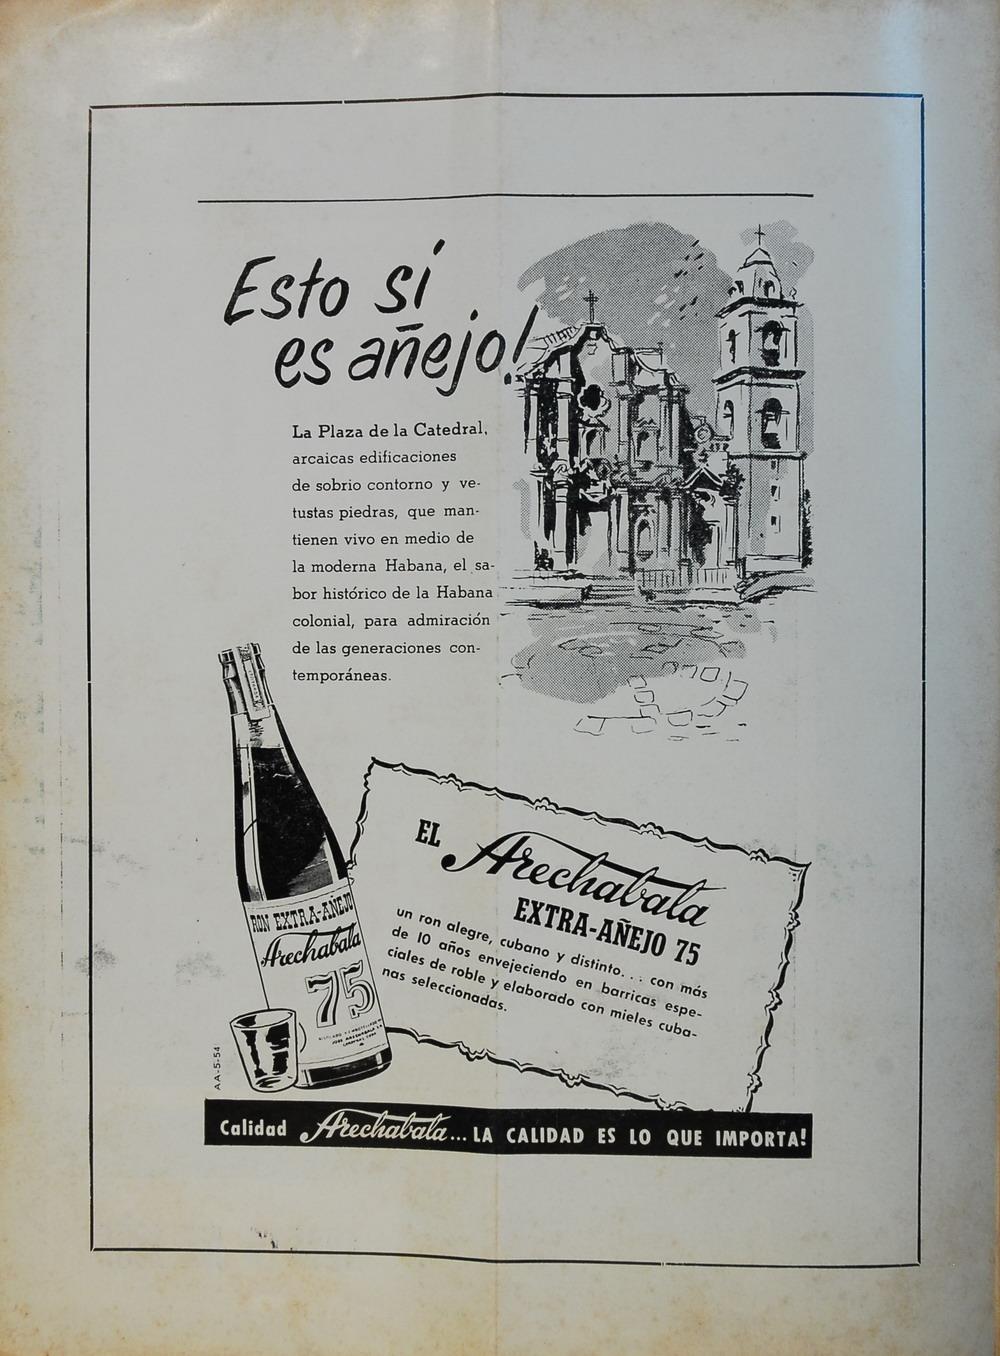 Anuncio Arechabala 75